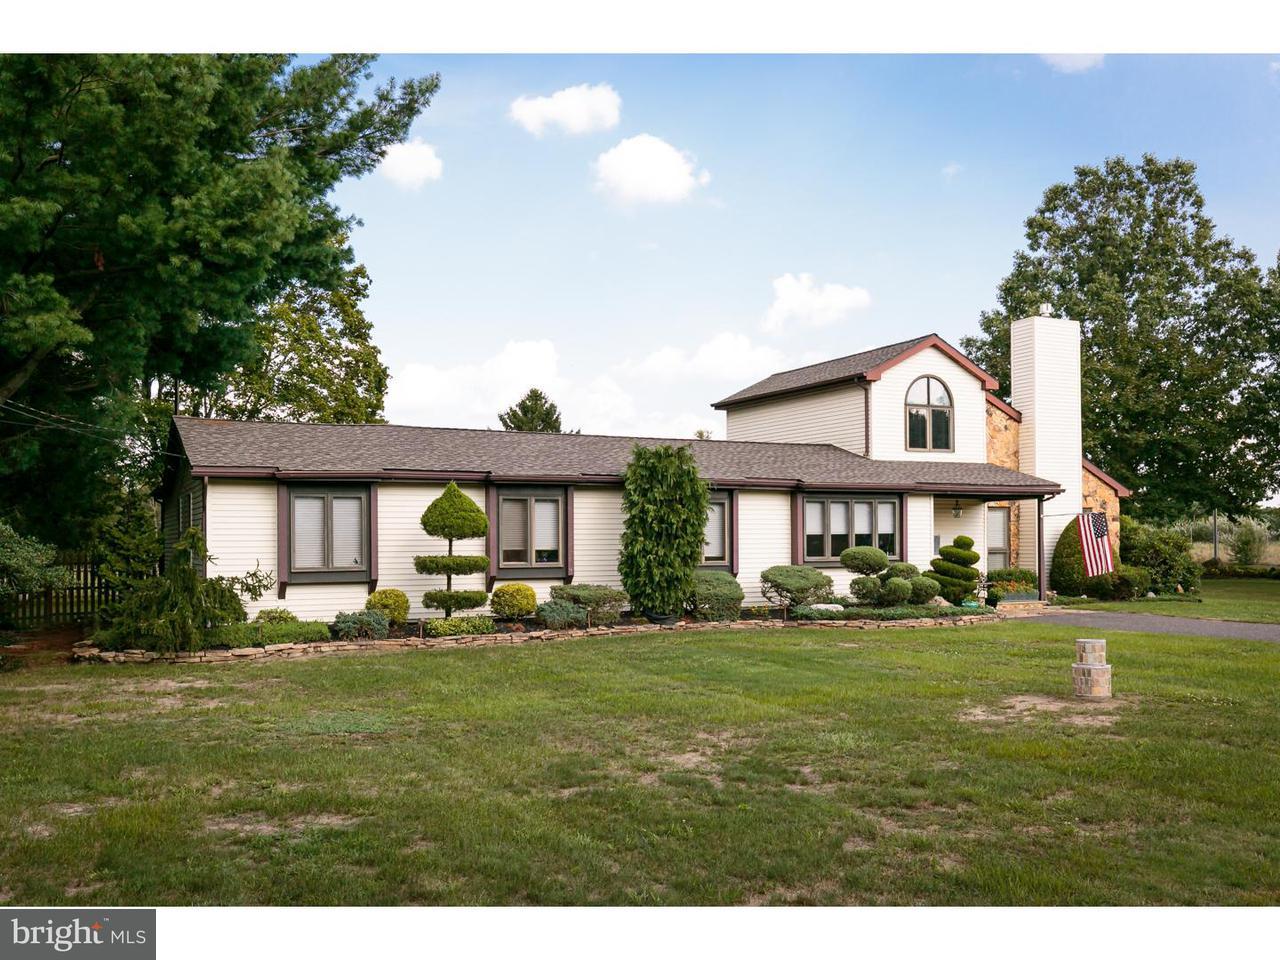 Частный односемейный дом для того Продажа на 326 OLD WHITE HORSE PIKE Waterford Works, Нью-Джерси 08089 Соединенные Штаты